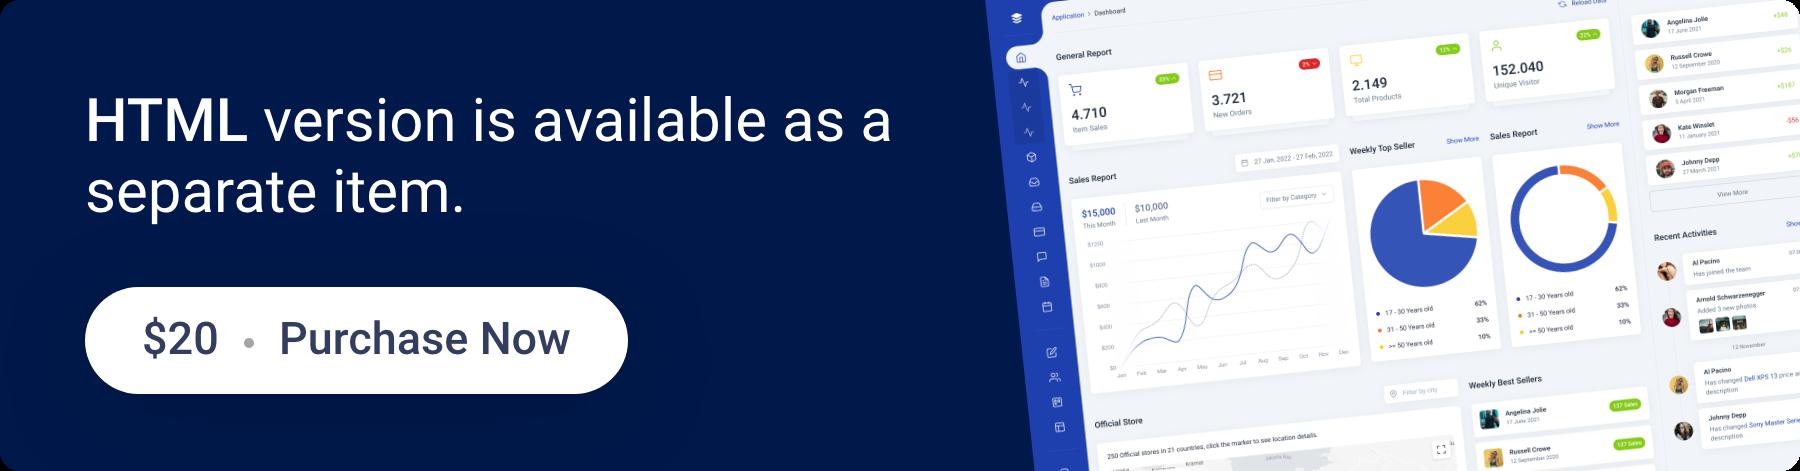 Midone - Laravel 8 Admin Dashboard Template + HTML Version - 2